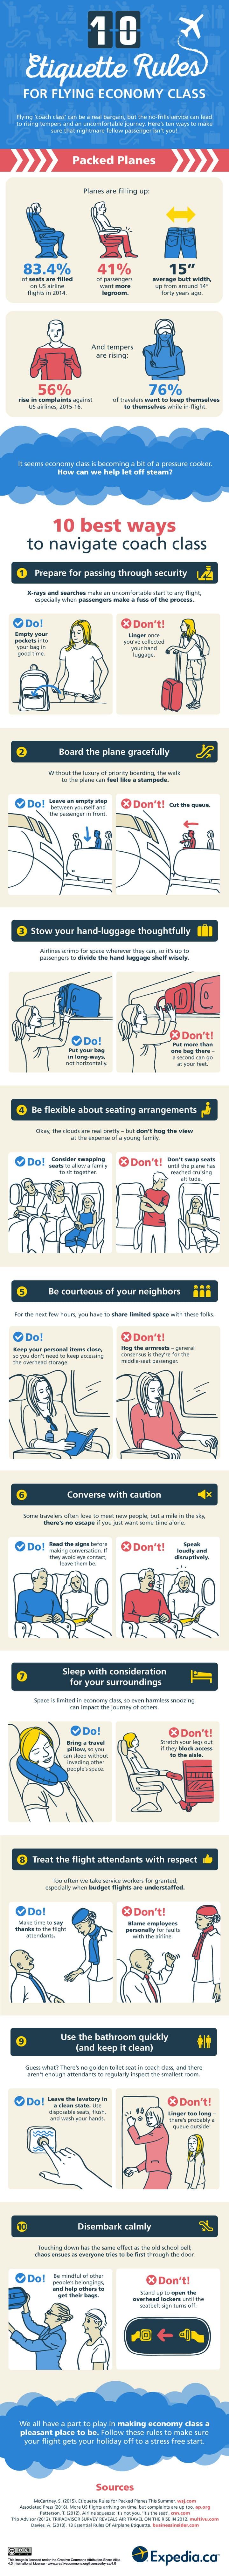 10-etiquette-rules